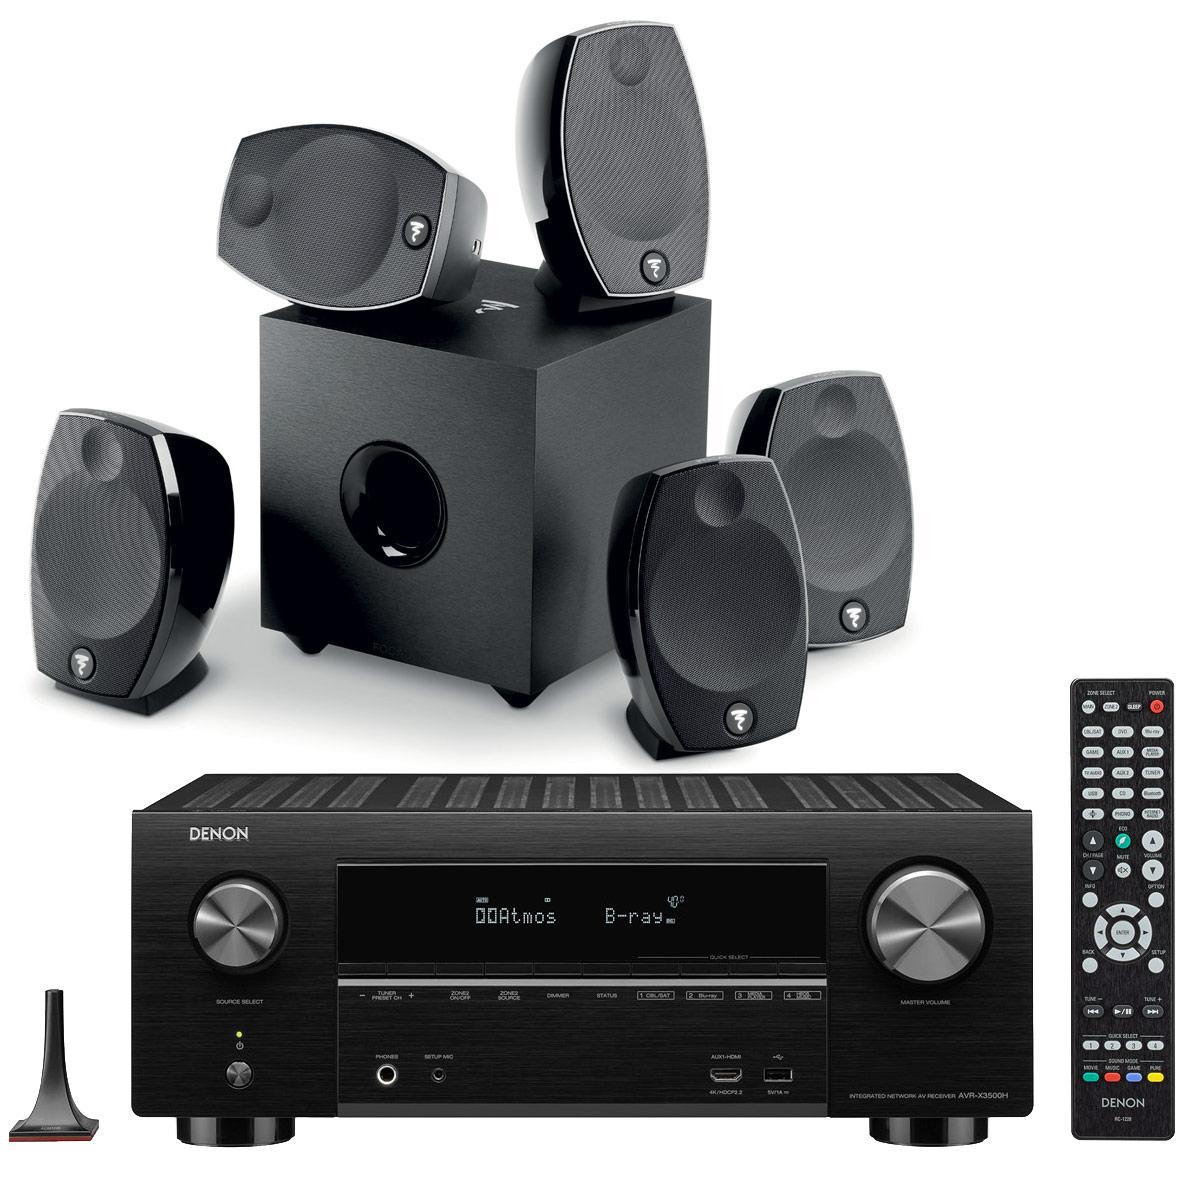 Ensemble home cinéma Denon AVR-X3500H Noir + Focal Sib Evo 5.1 Ampli-tuner Home Cinema 3D Ready 7.2 - Dolby Atmos / DTS:X - 8x HDMI 4K Ultra HD, HDCP 2.2, HDR - Wi-Fi, Bluetooth, AirPlay 2 - Multiroom - Amazon Alexa + Pack d'enceintes 5.1